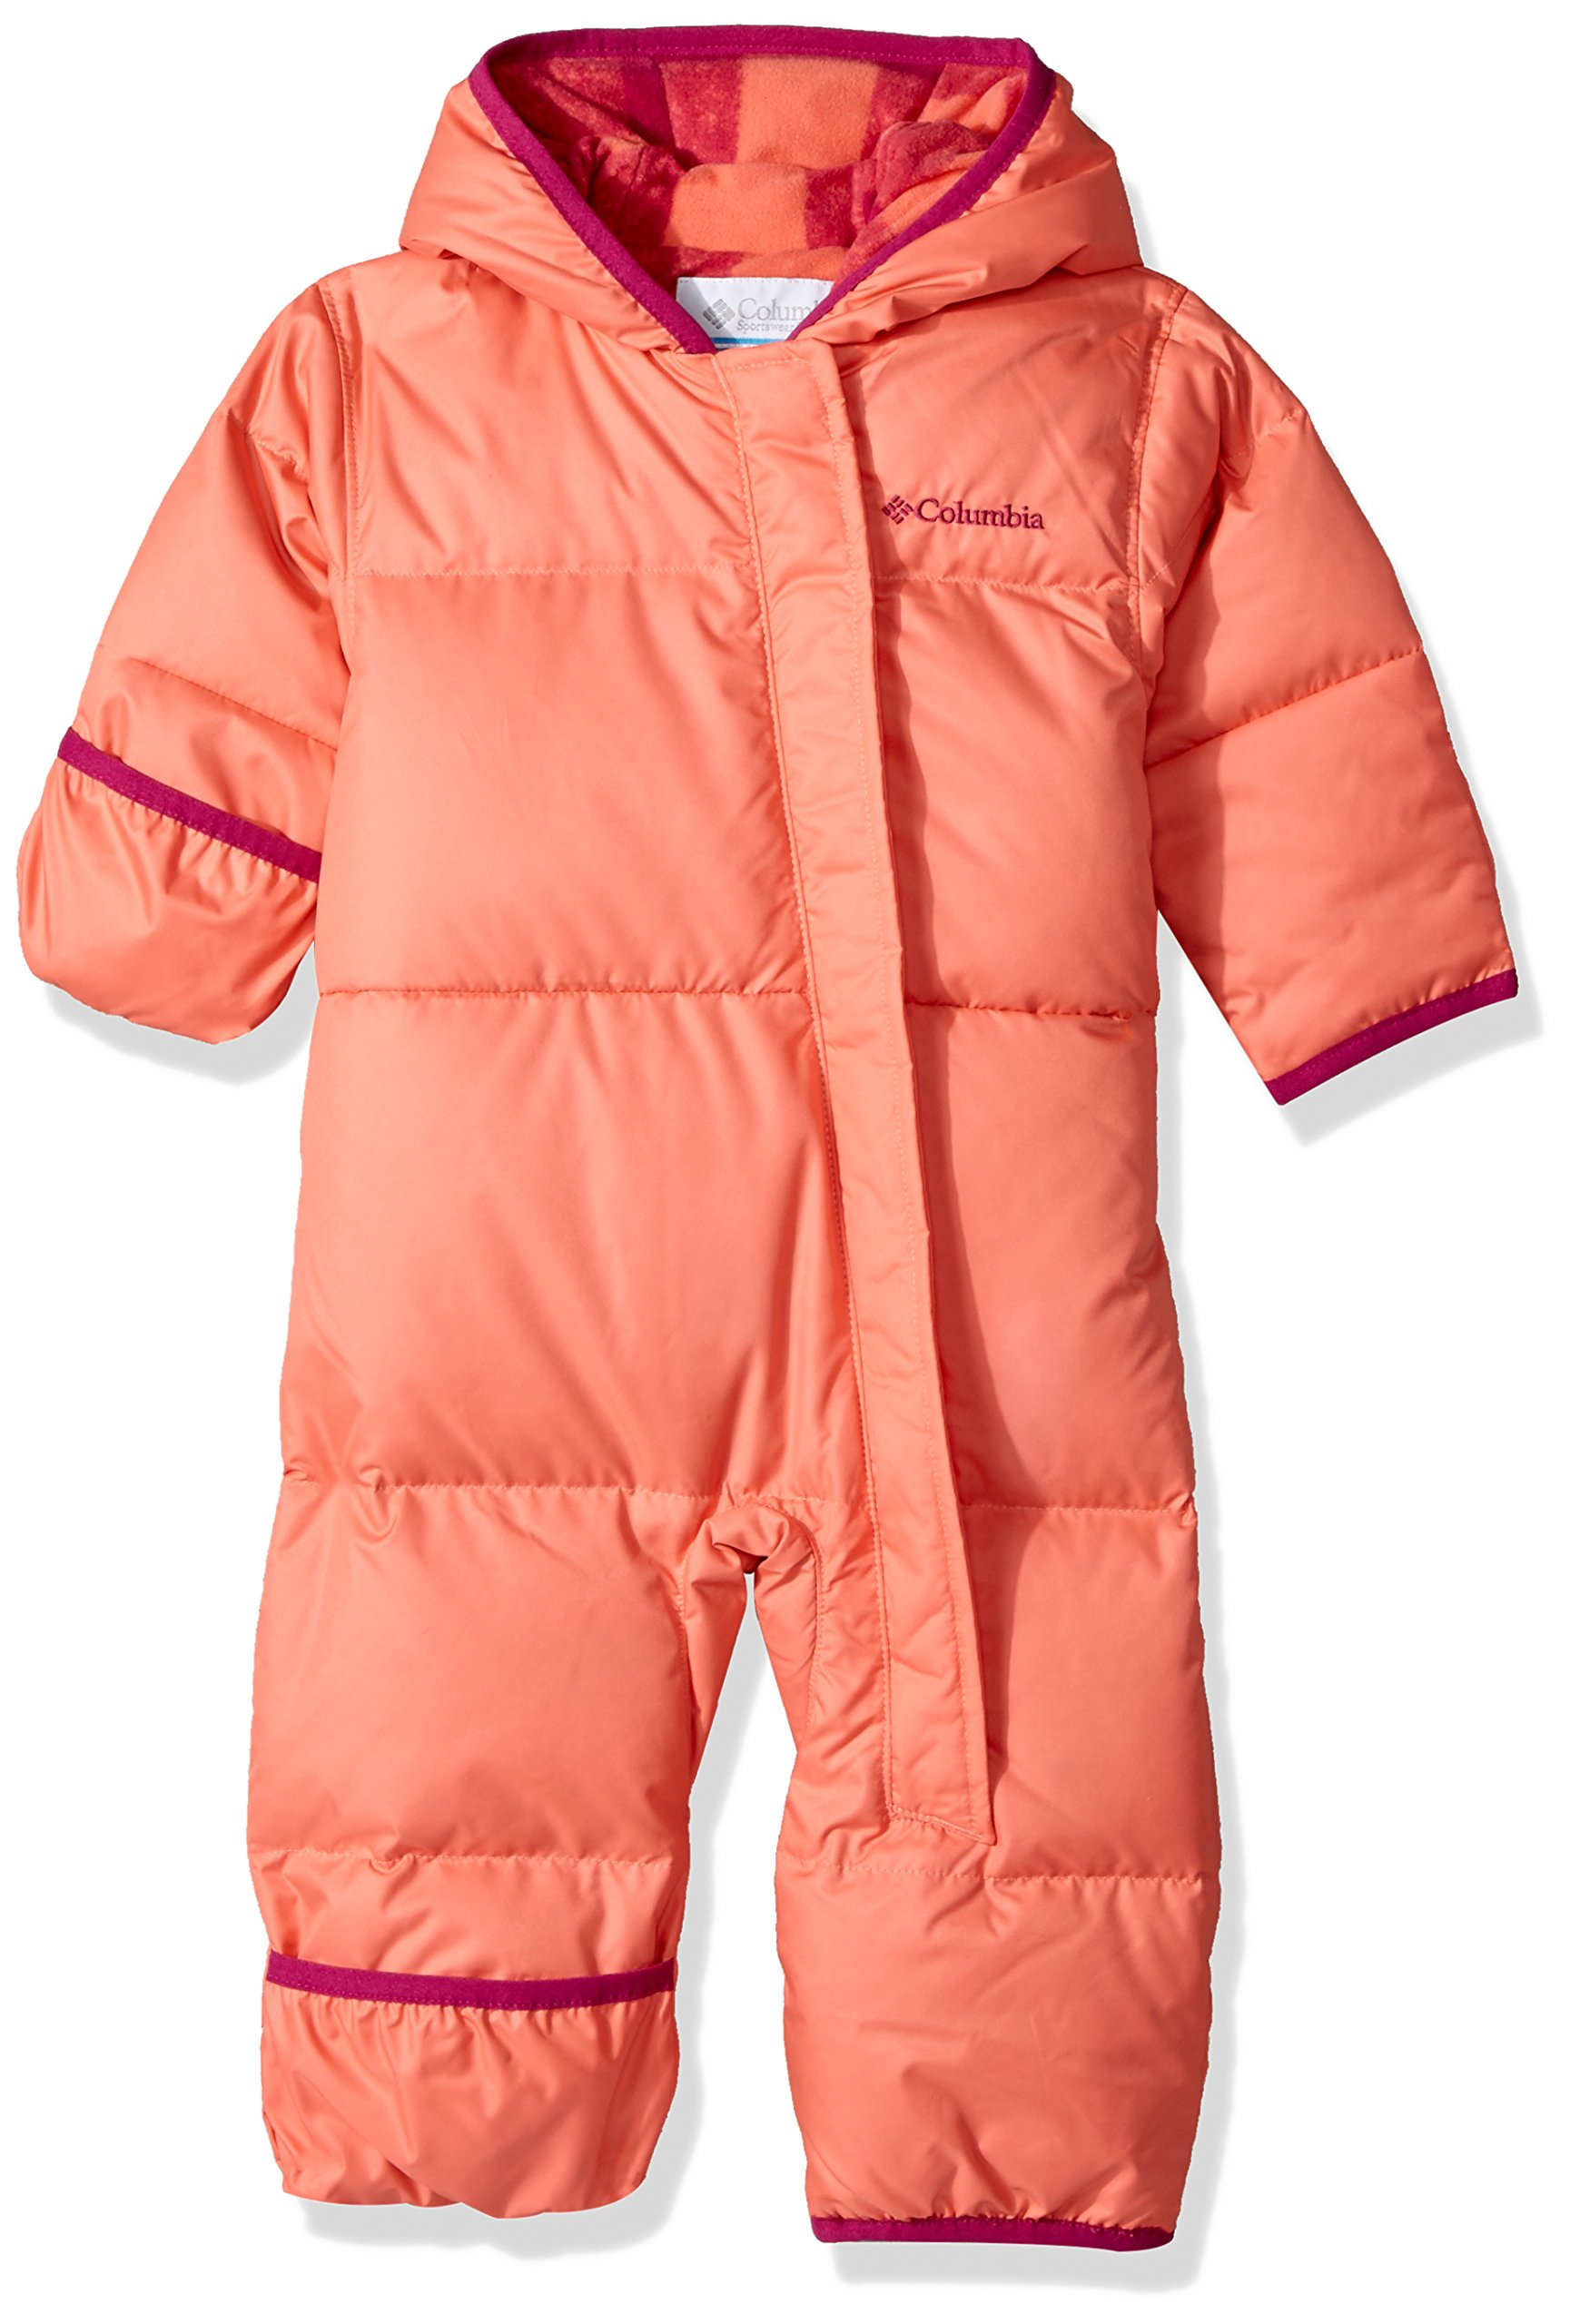 e2ed75847673 Galleon - Columbia Baby Boys  Snuggly Bunny Bunting